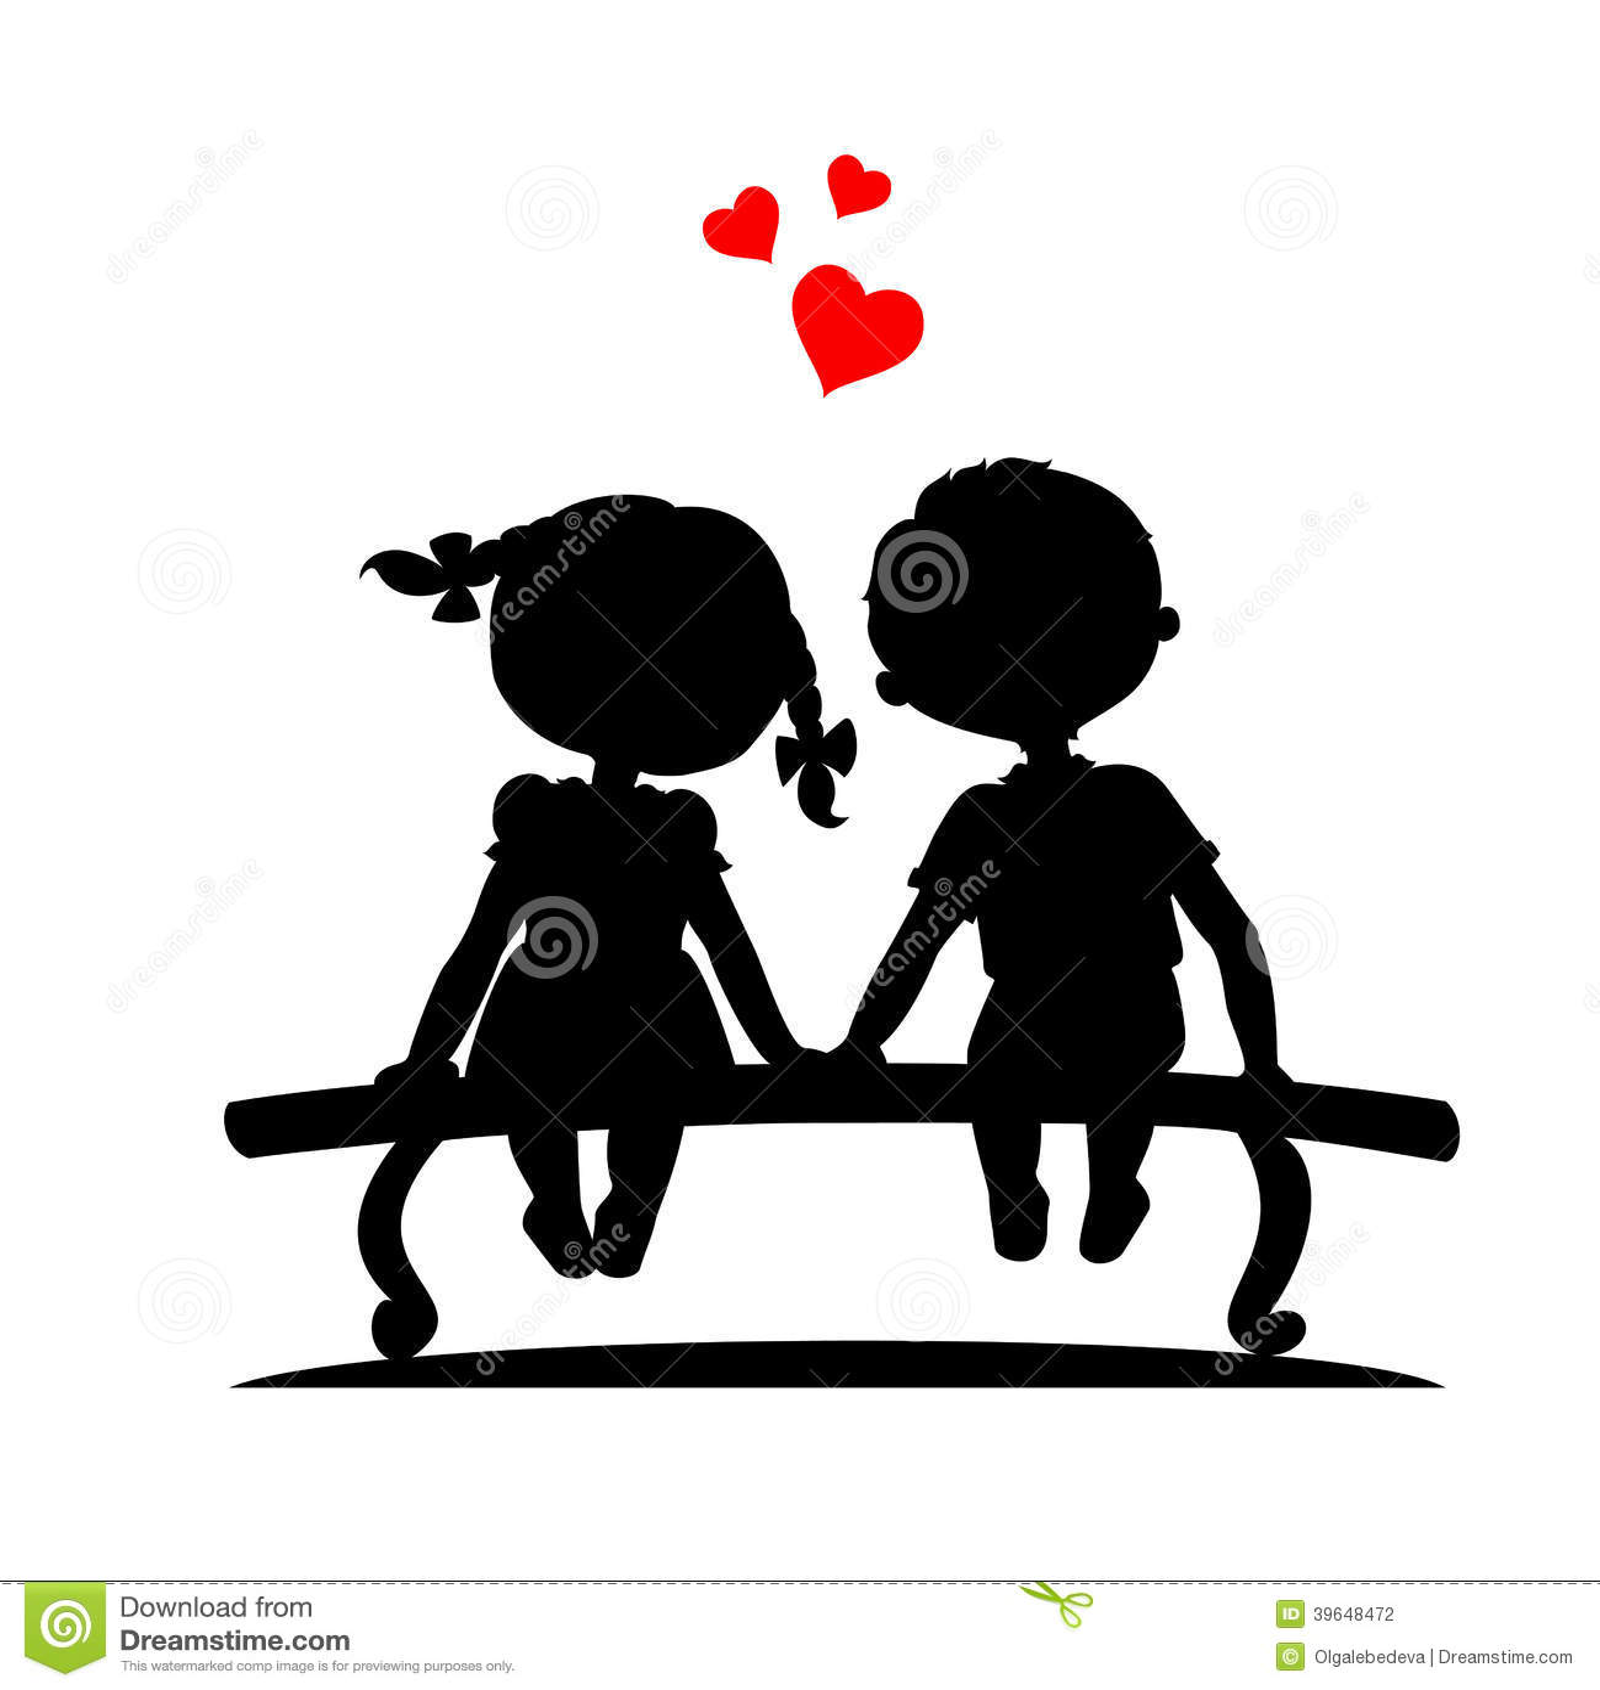 Girl And Boy Sitting On Banch Wallpaper Silhouetten Van Jongen En Meisje Vector Illustratie